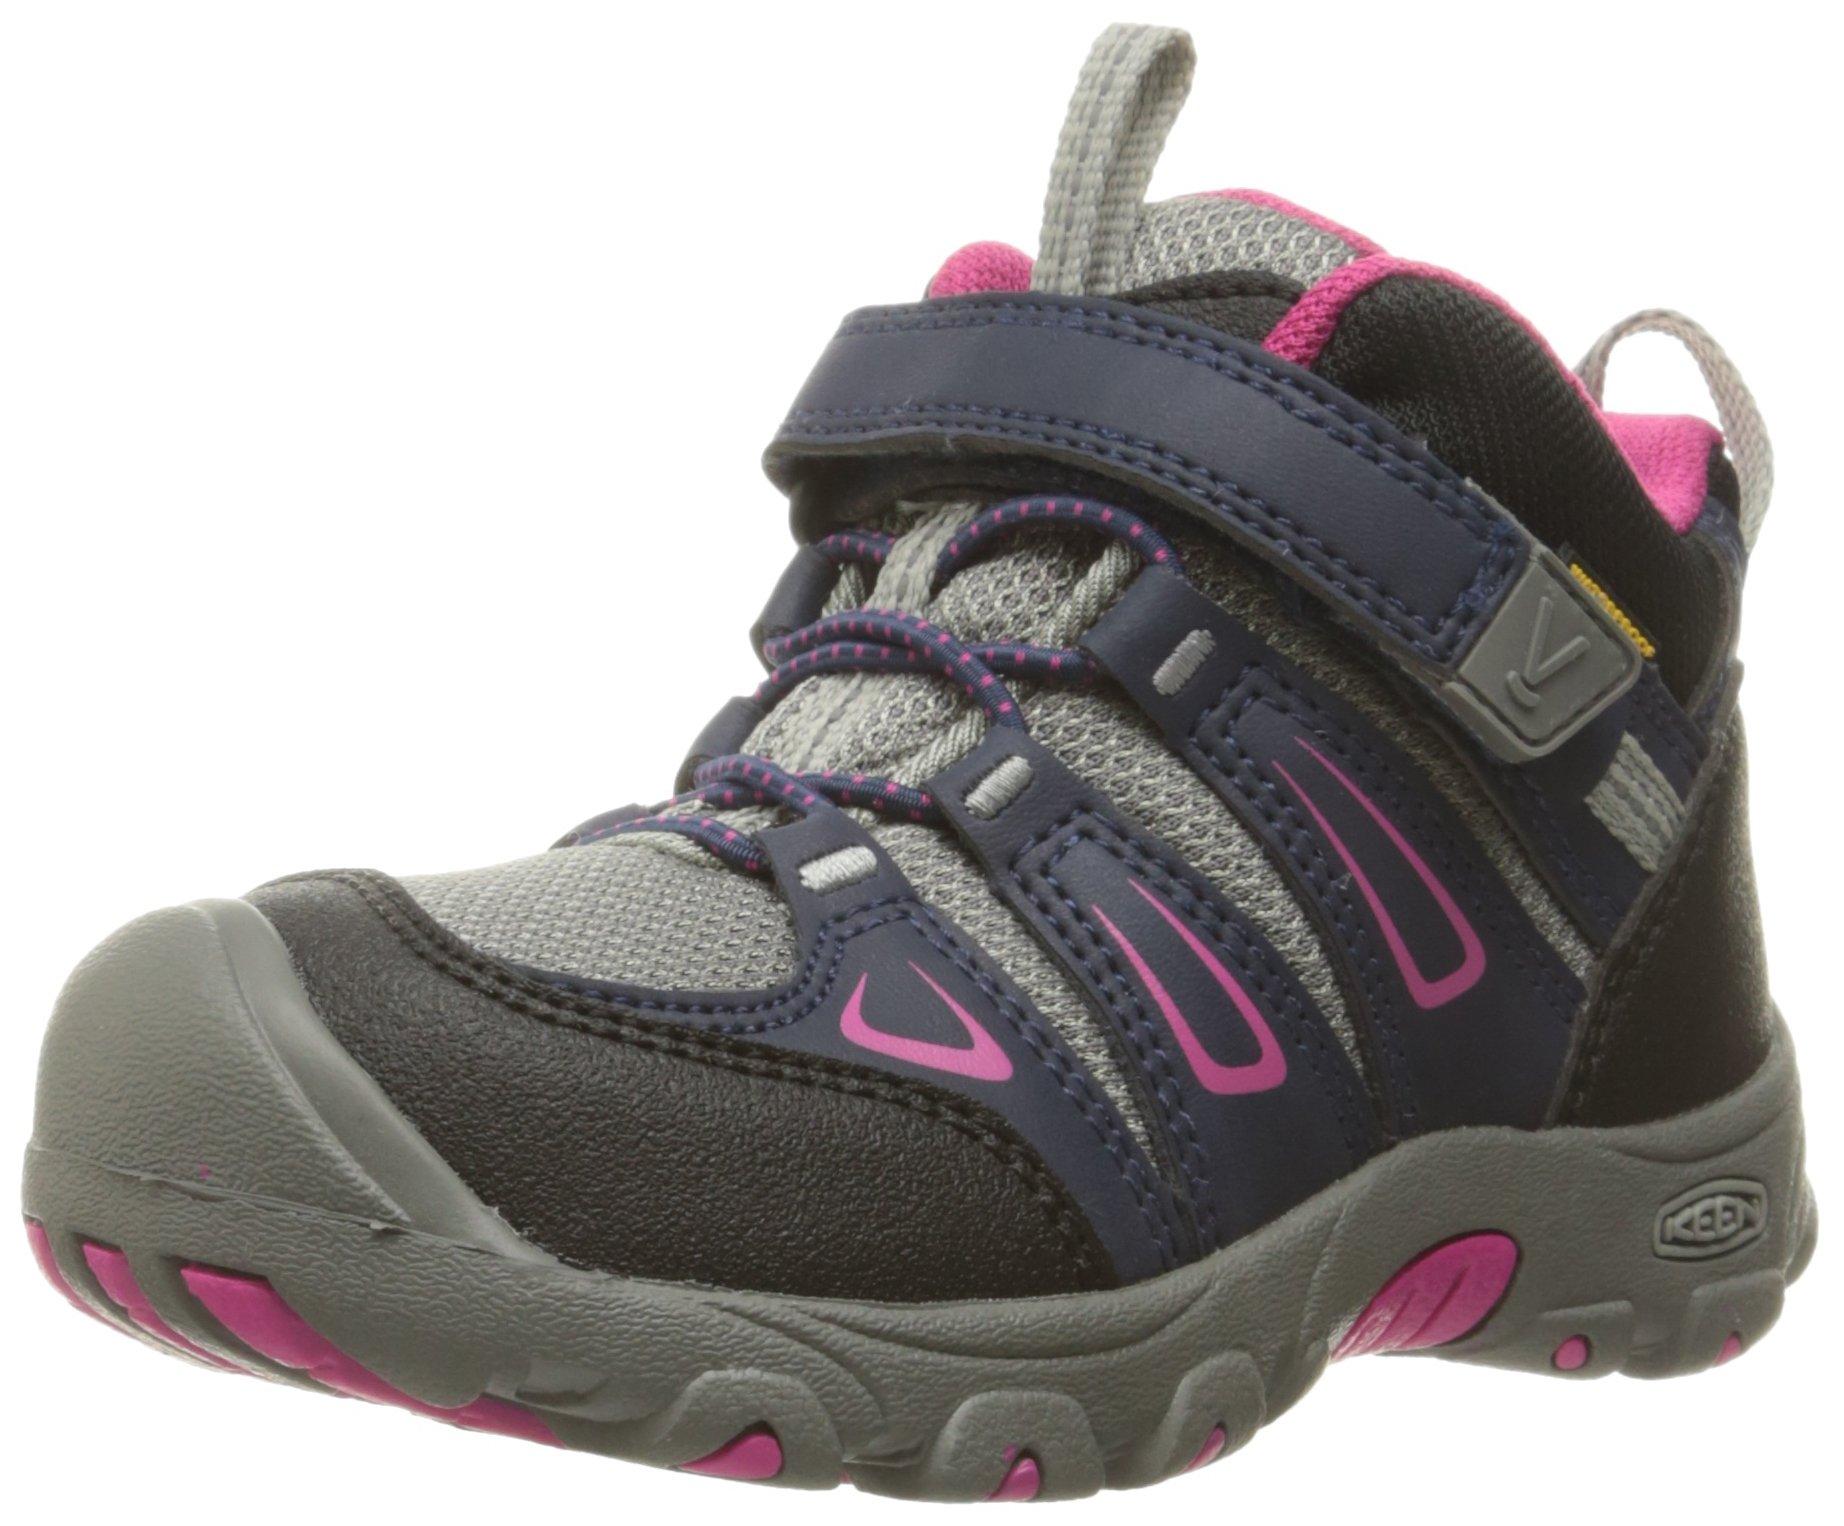 KEEN Oakridge Mid WP Hiking Shoe (Toddler/Little Kid), Dress Blue/Very Berry, 9 M US Toddler